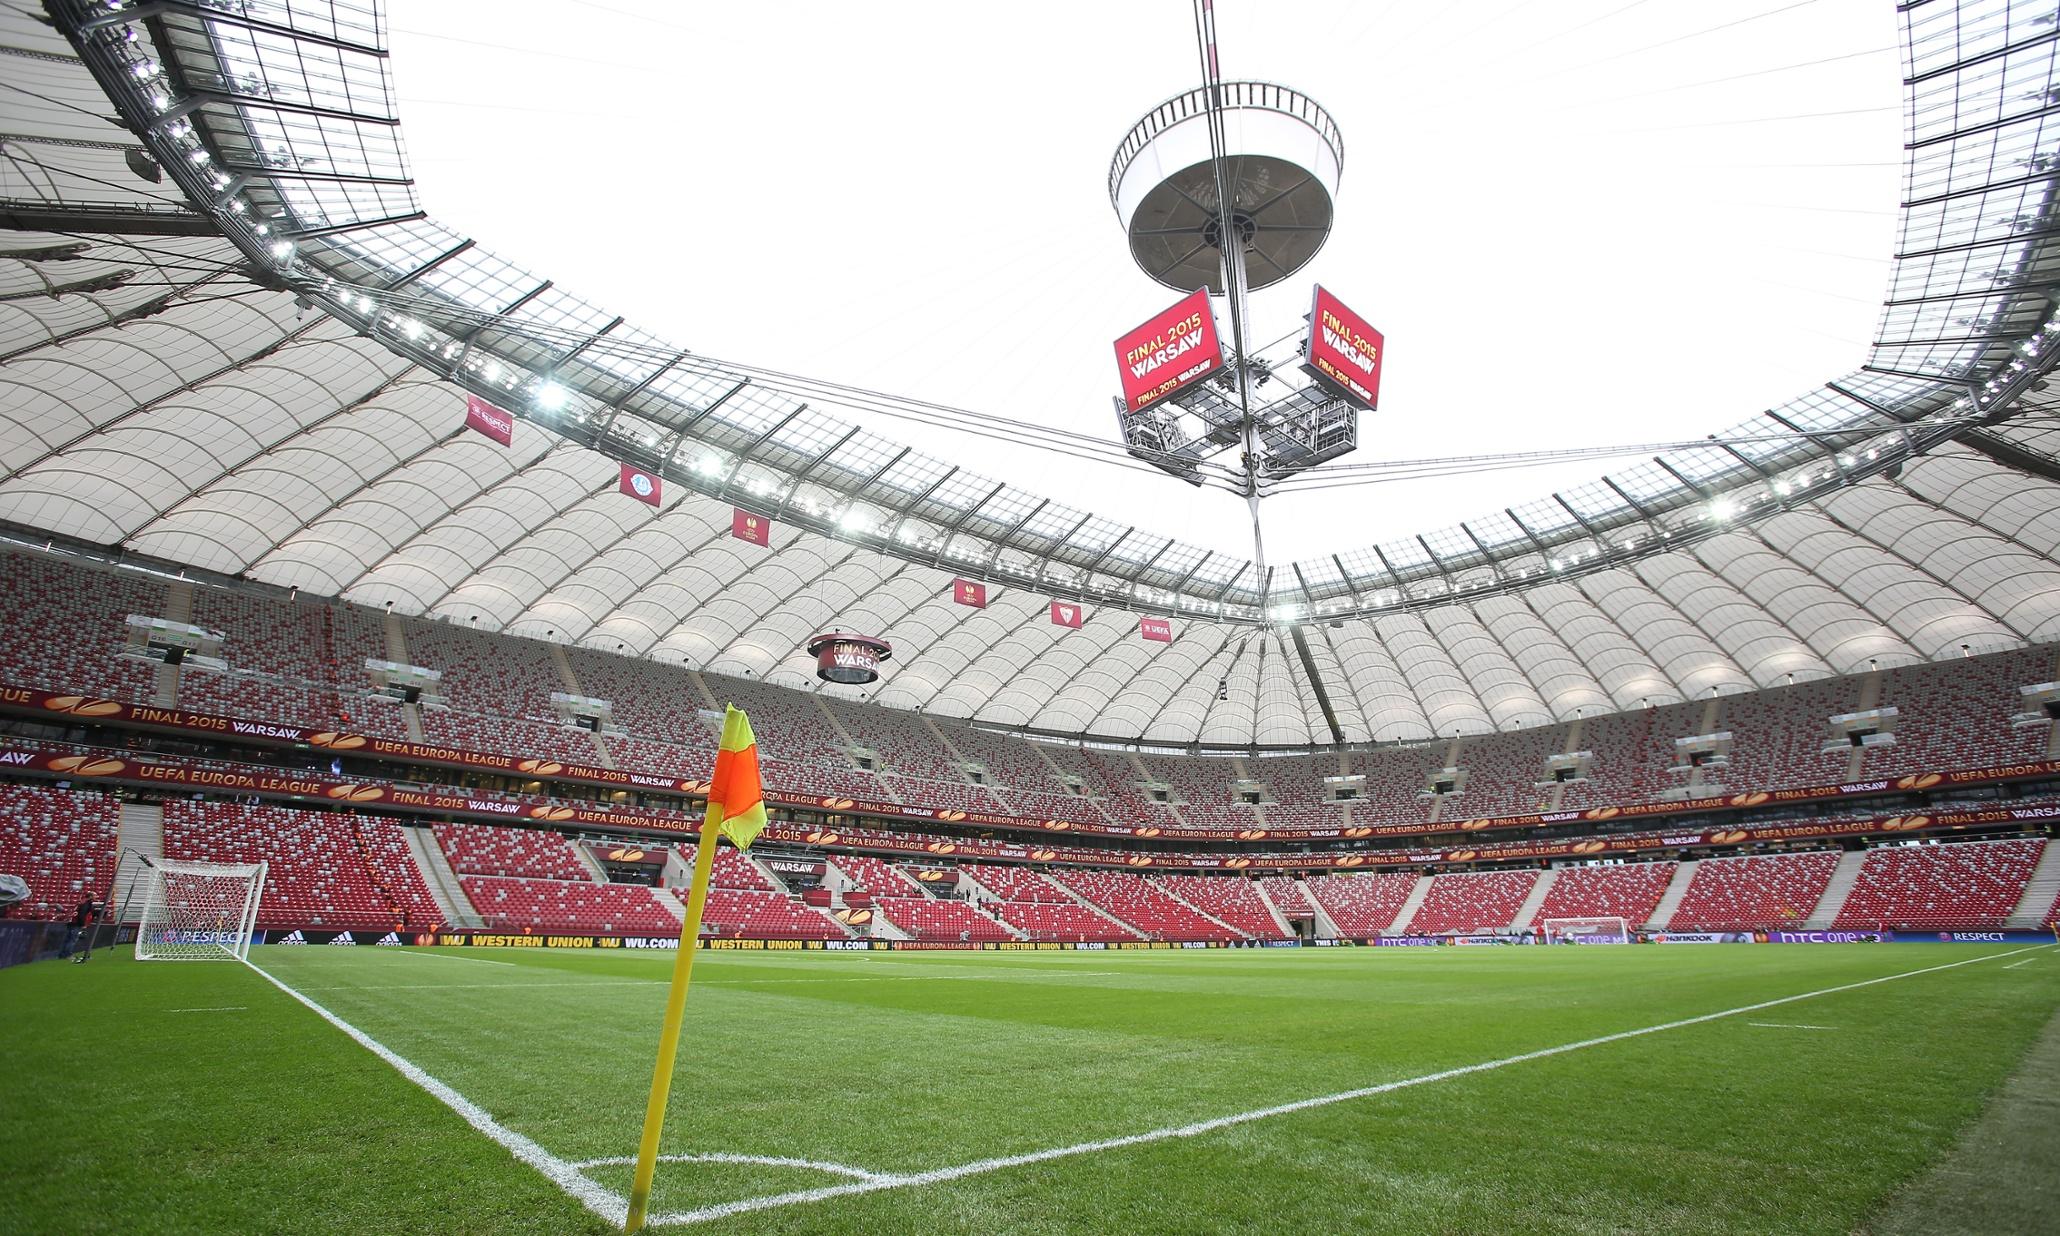 UEFA Europa League 2014/15 Final Dnipro Dnipropetrovsk v Sevilla Narodowy Stadium, Warsaw, Poland - 27 May 2015